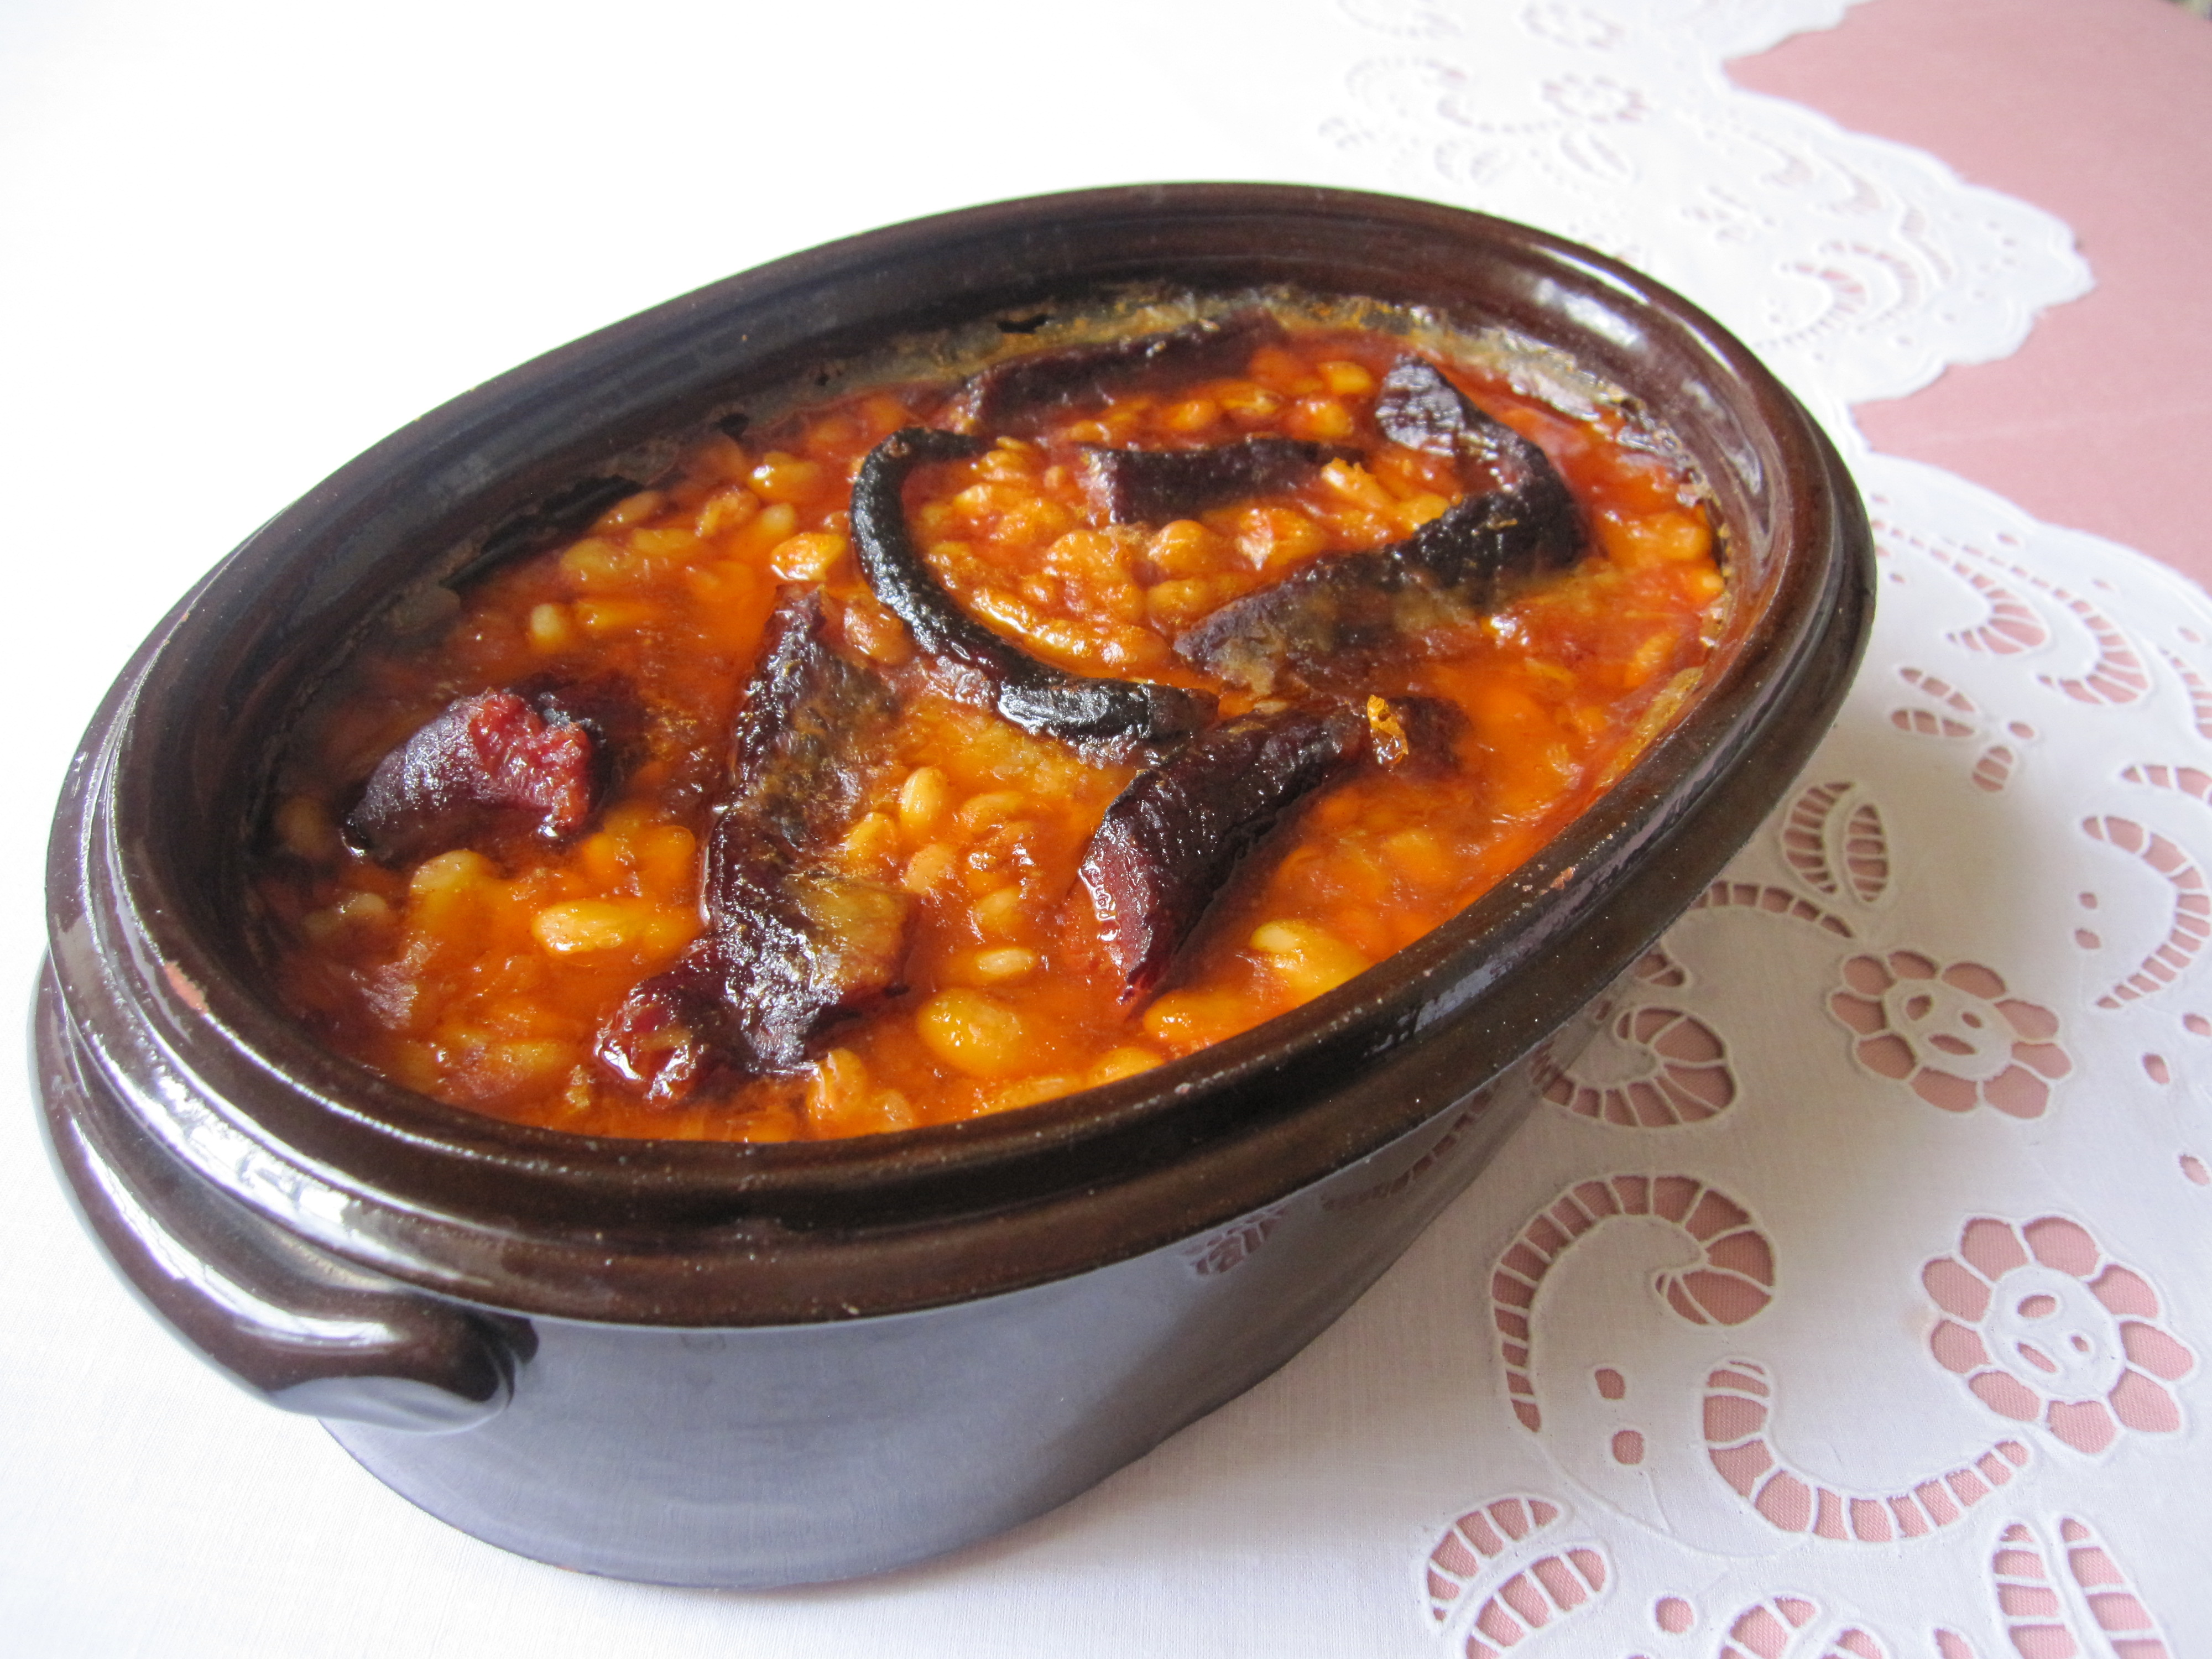 Albanische kuche wien